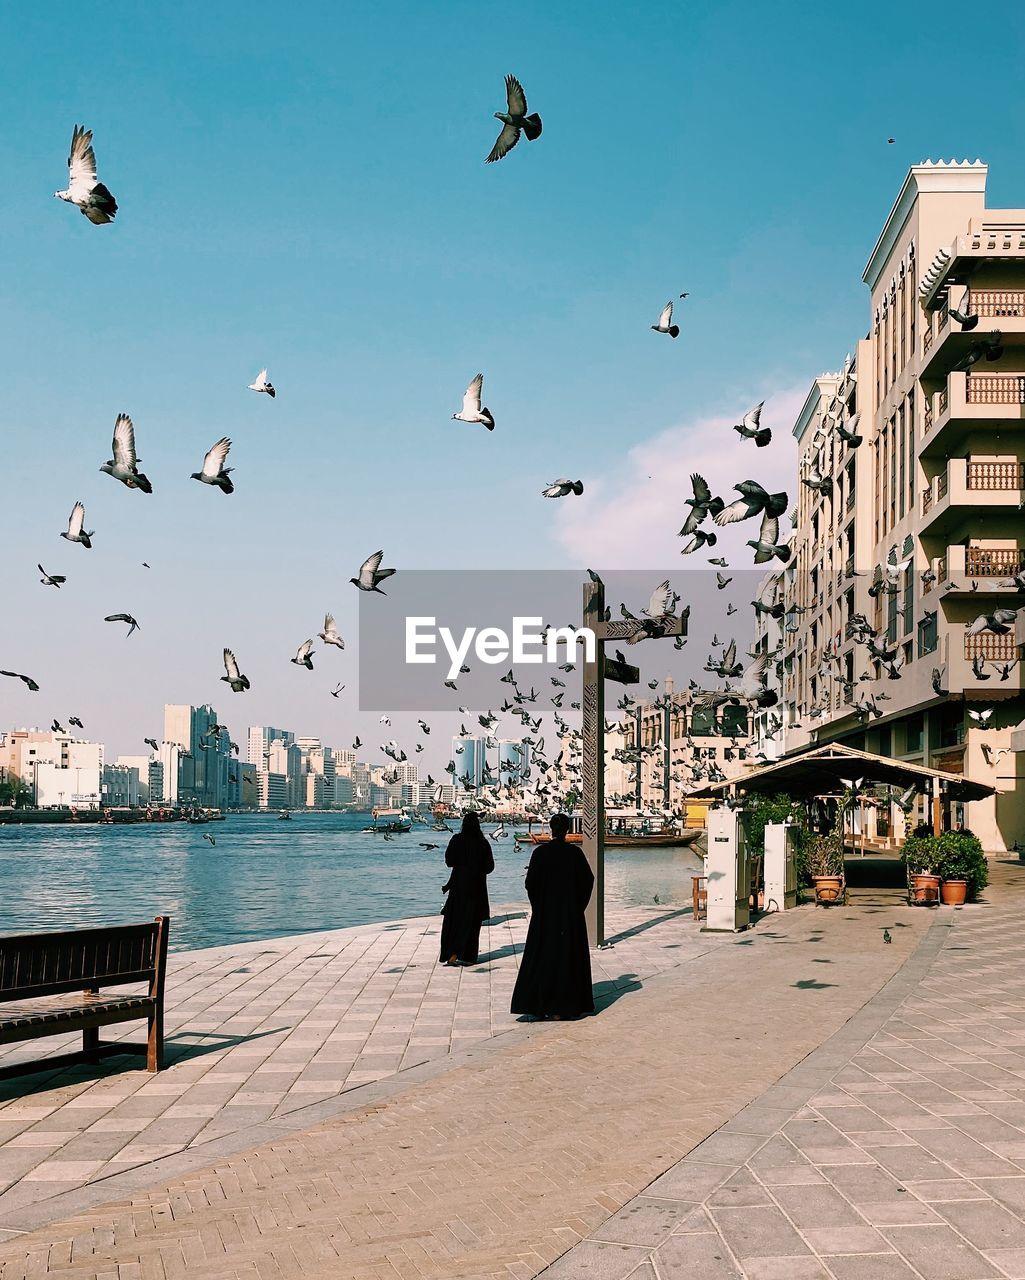 Arabic women walking near the dubai creek in bur dubai with pigeons flying above their heads.